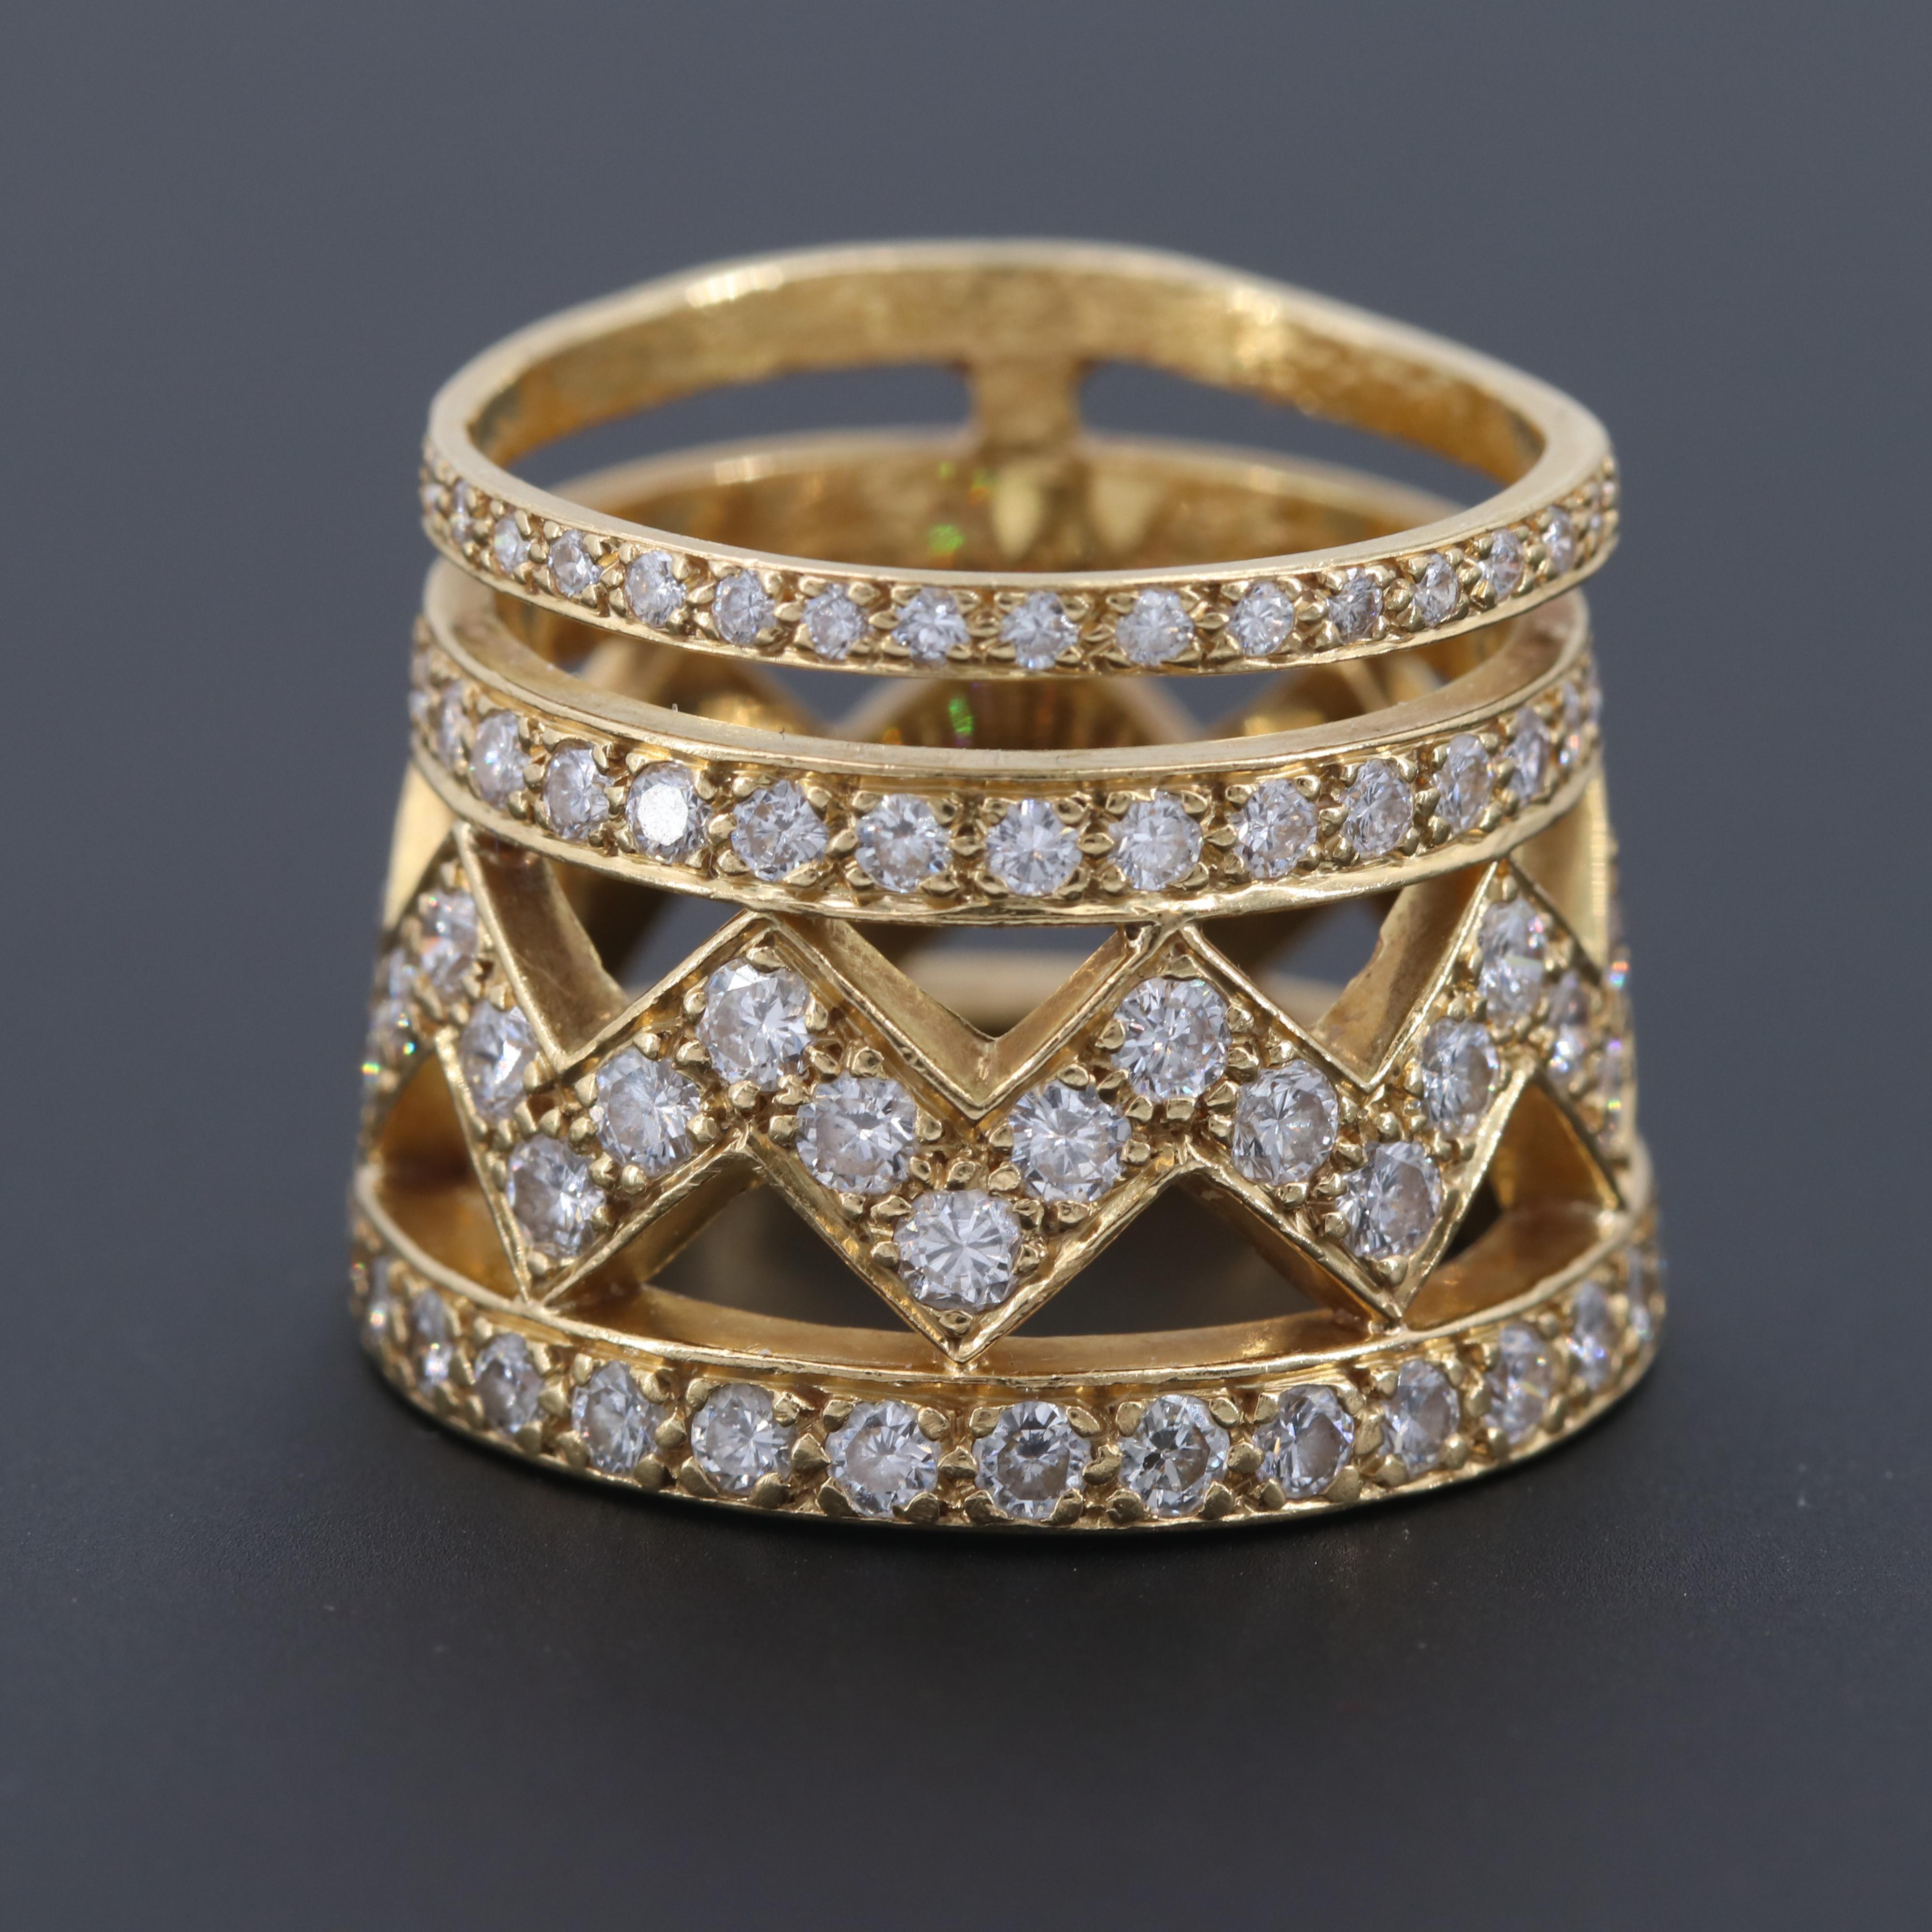 18K Yellow Gold 1.57 CTW Diamond Ring